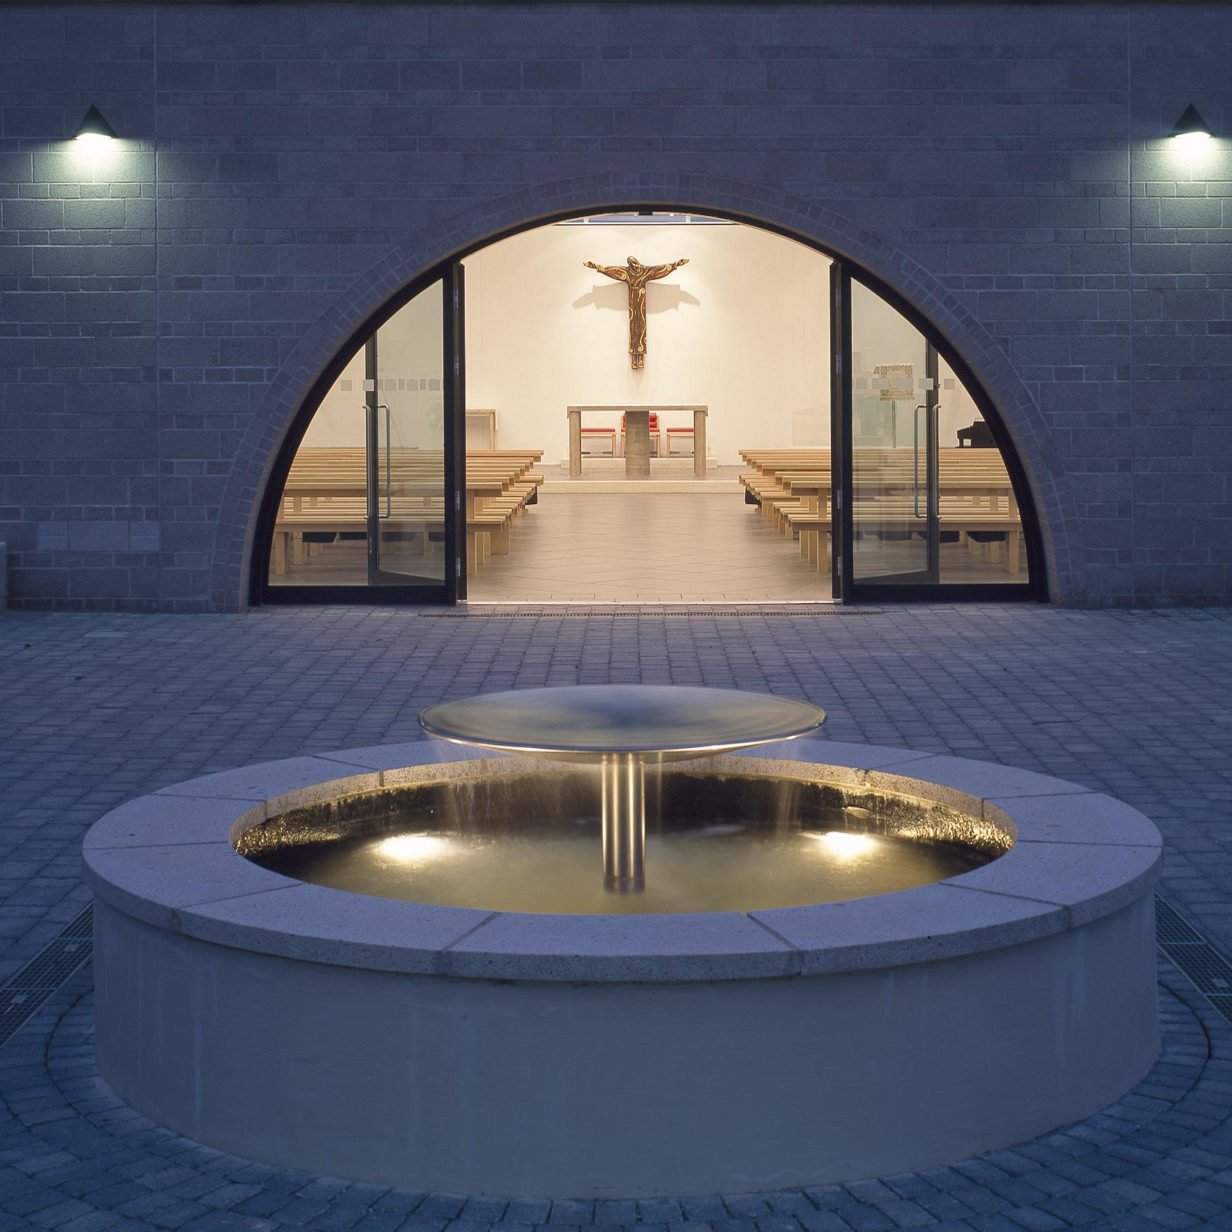 JBKS Architects